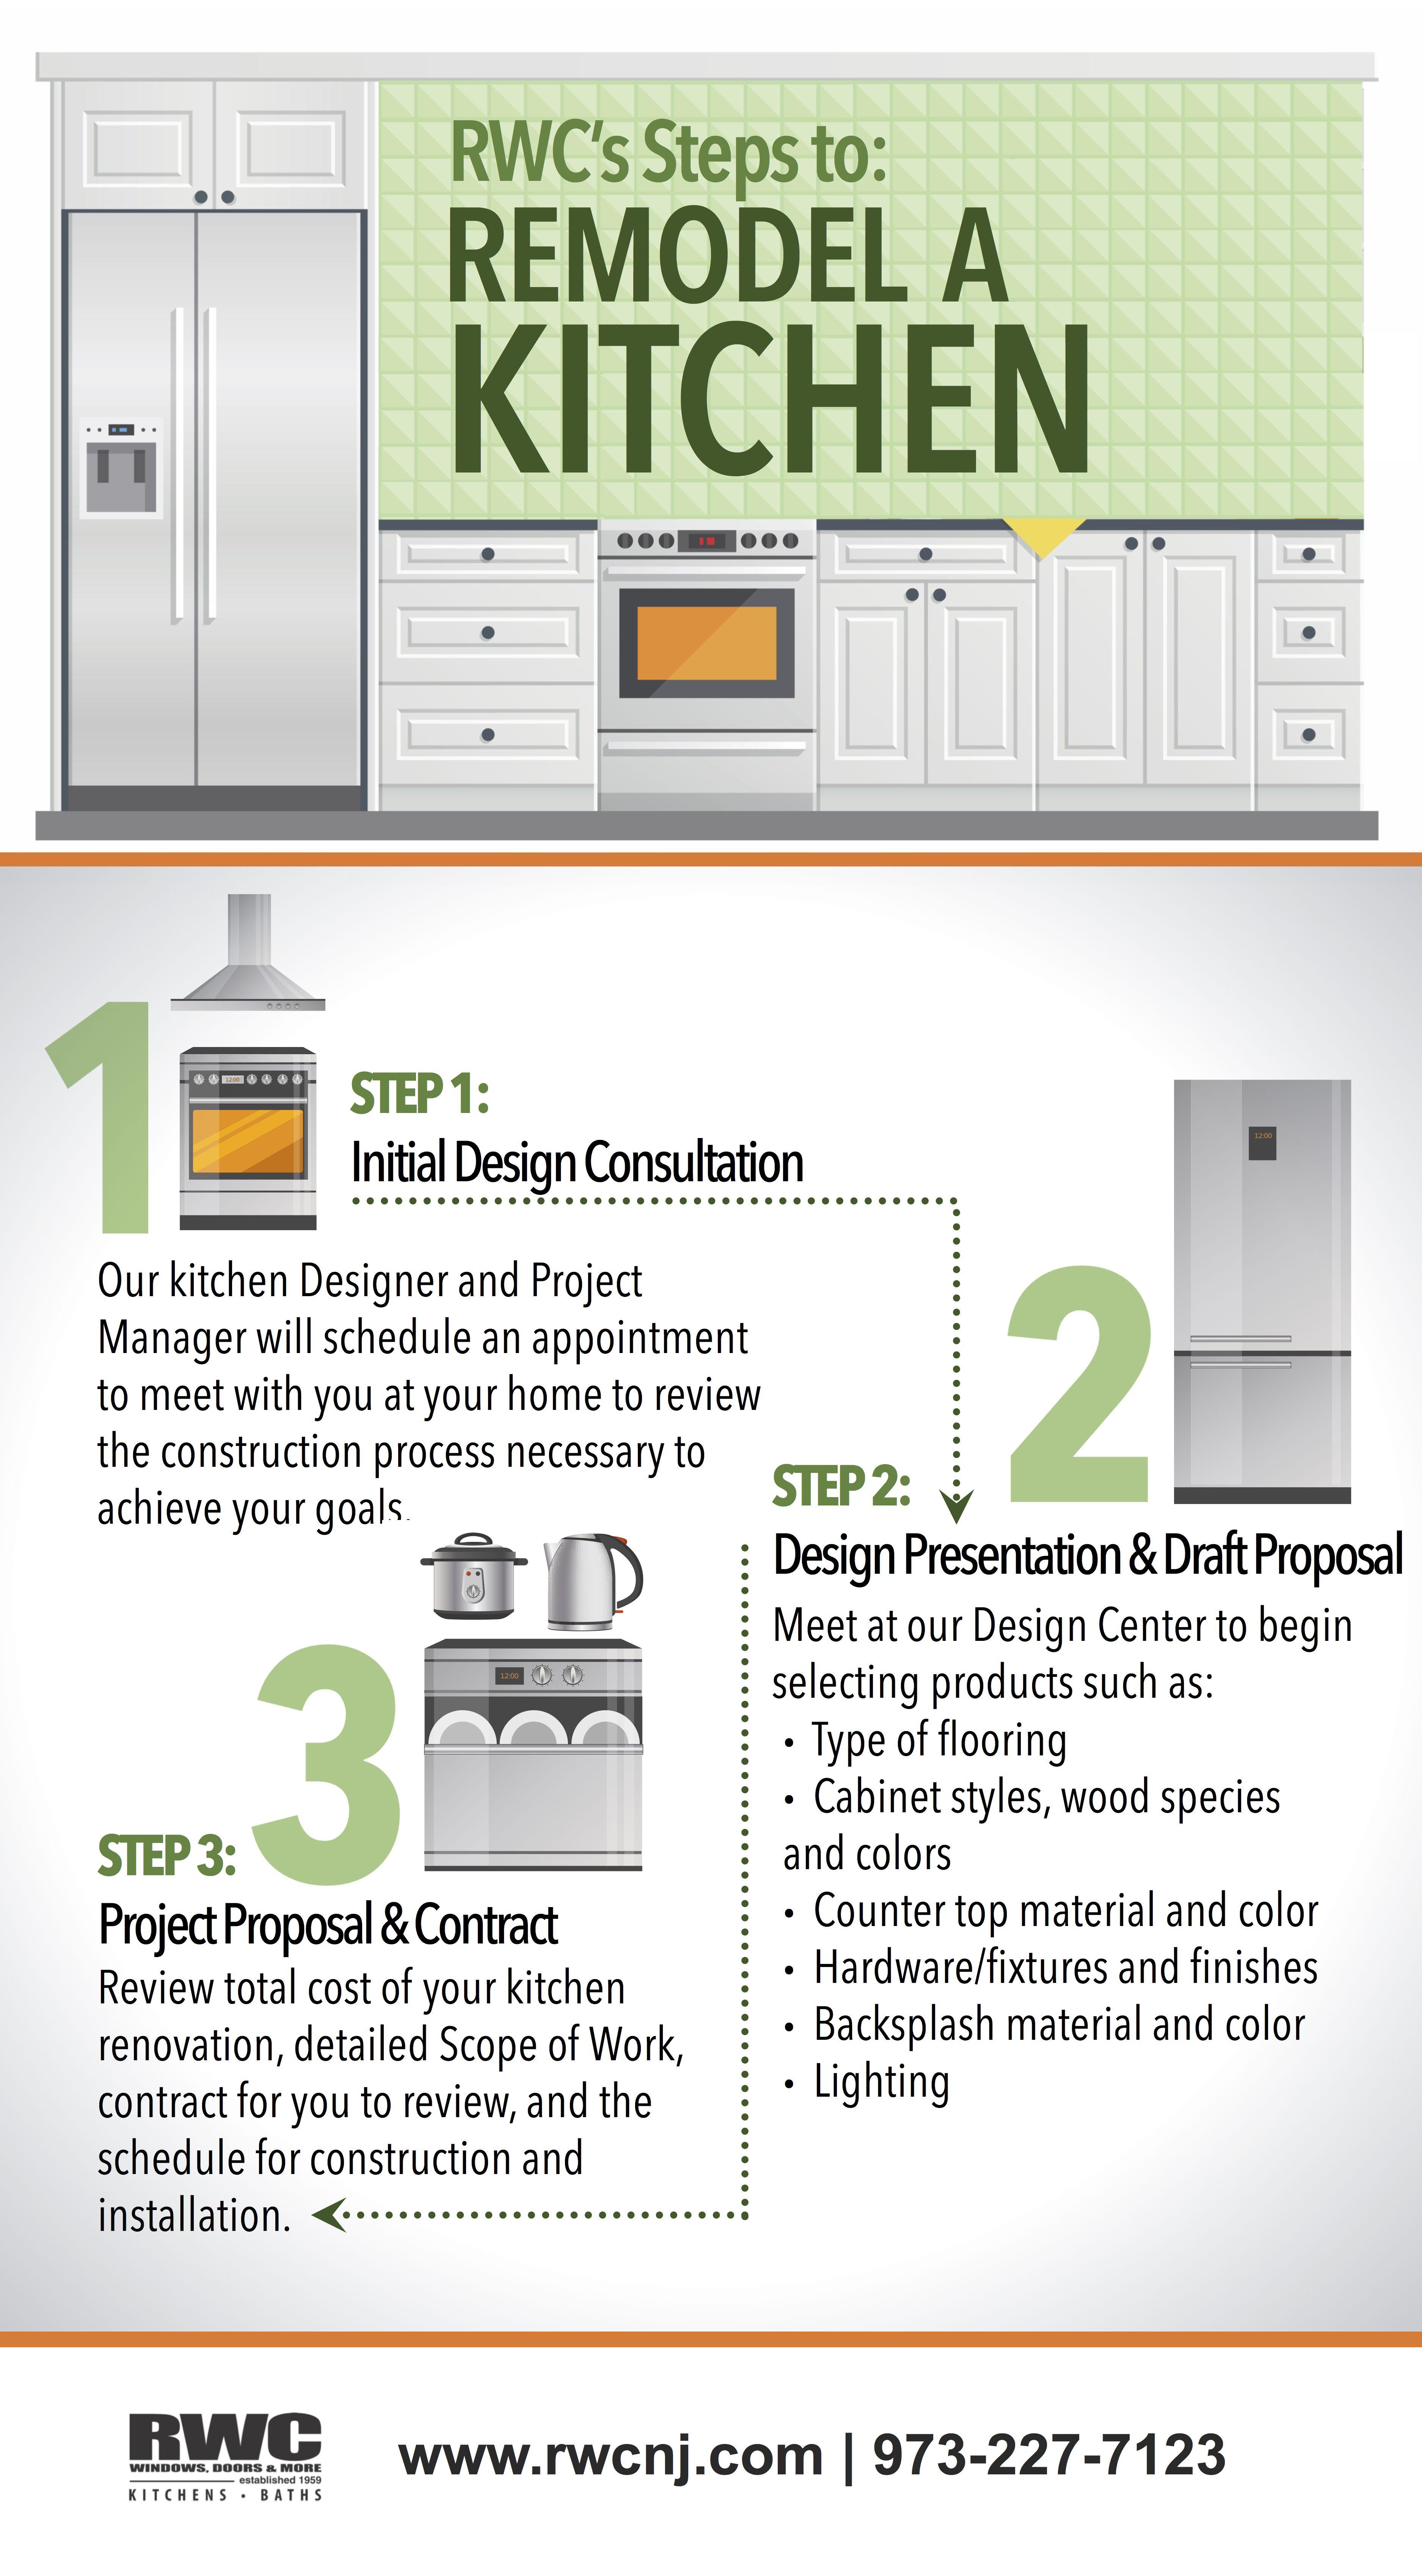 3 Steps To Remodeling A Kitchen You Should Know Infographic Rwc Kitchen Remodel Design Kitchen Diy Makeover Kitchen Remodel